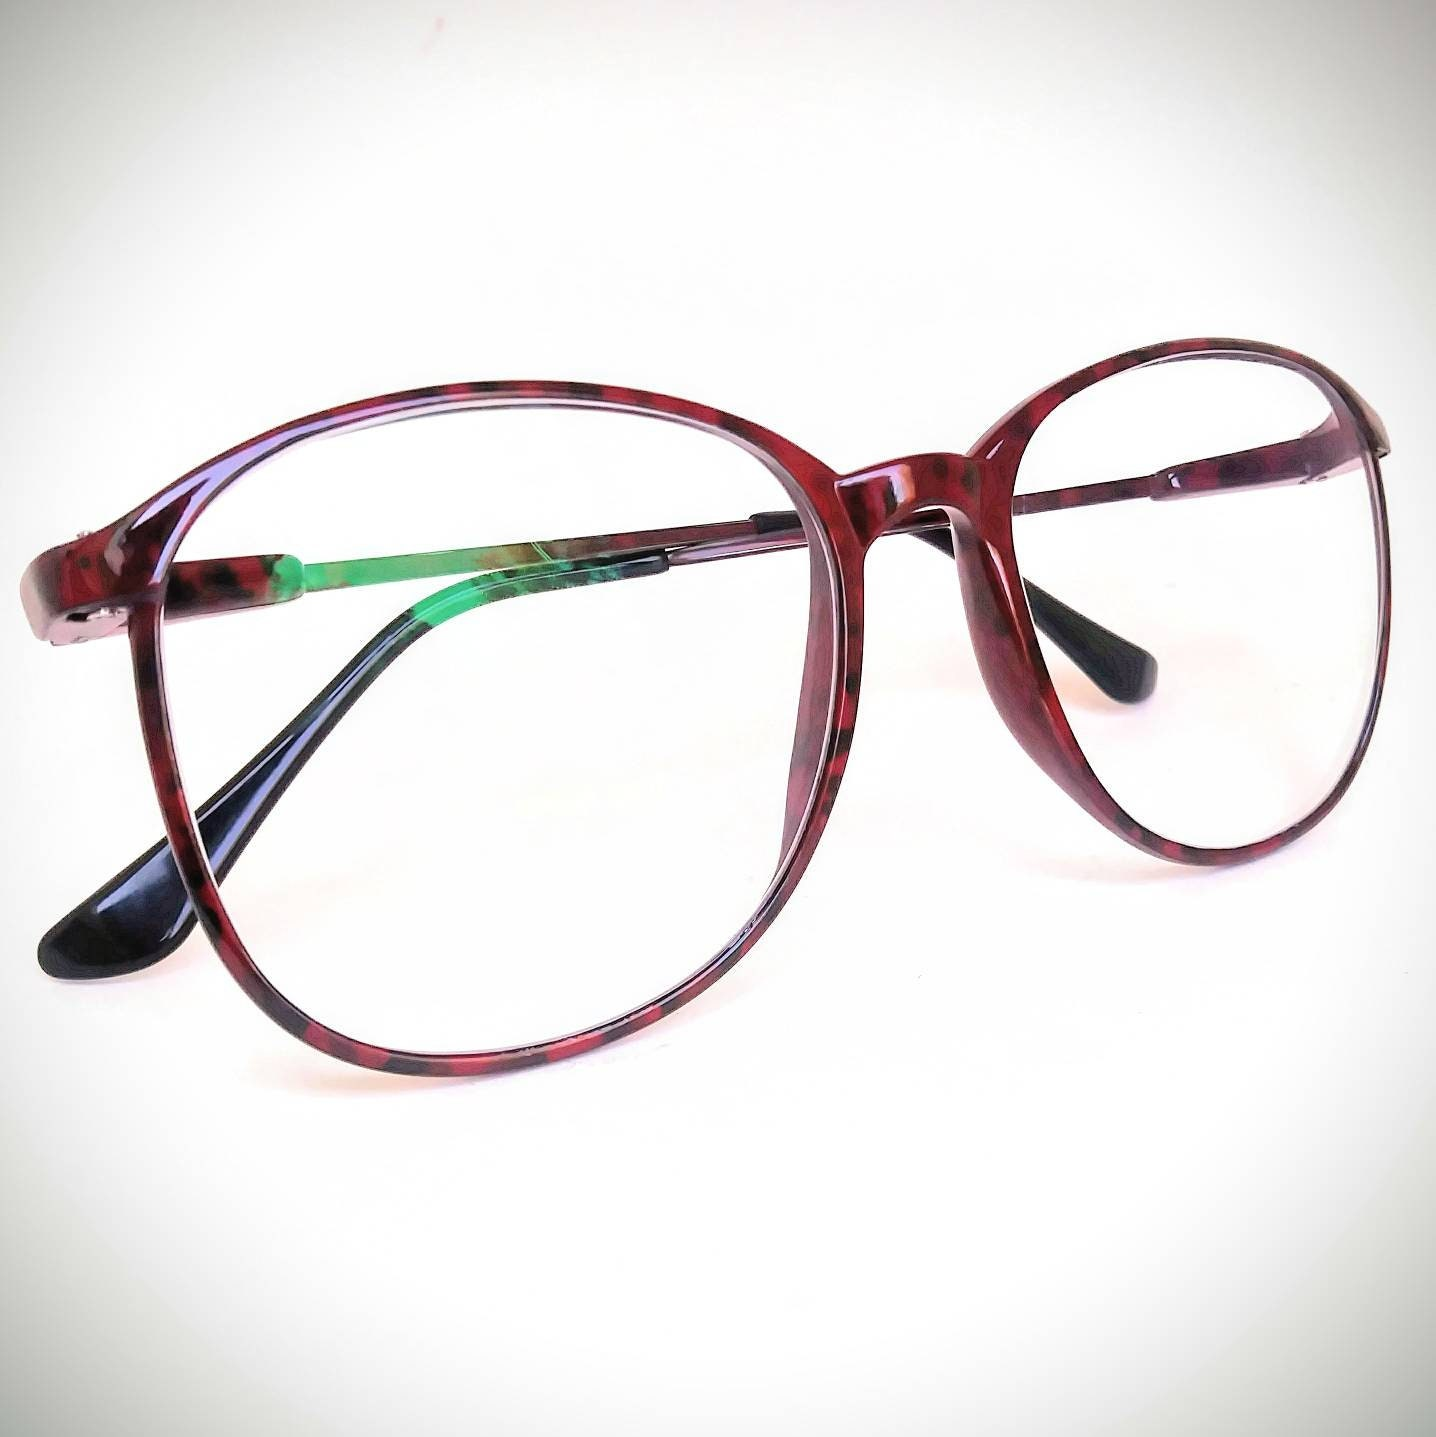 fc6ddc28a08a5 1990s Carbon Fiber Non-Prescription Vintage Eyeglasses with Non-Glare Lenses   Ready-to-Wear